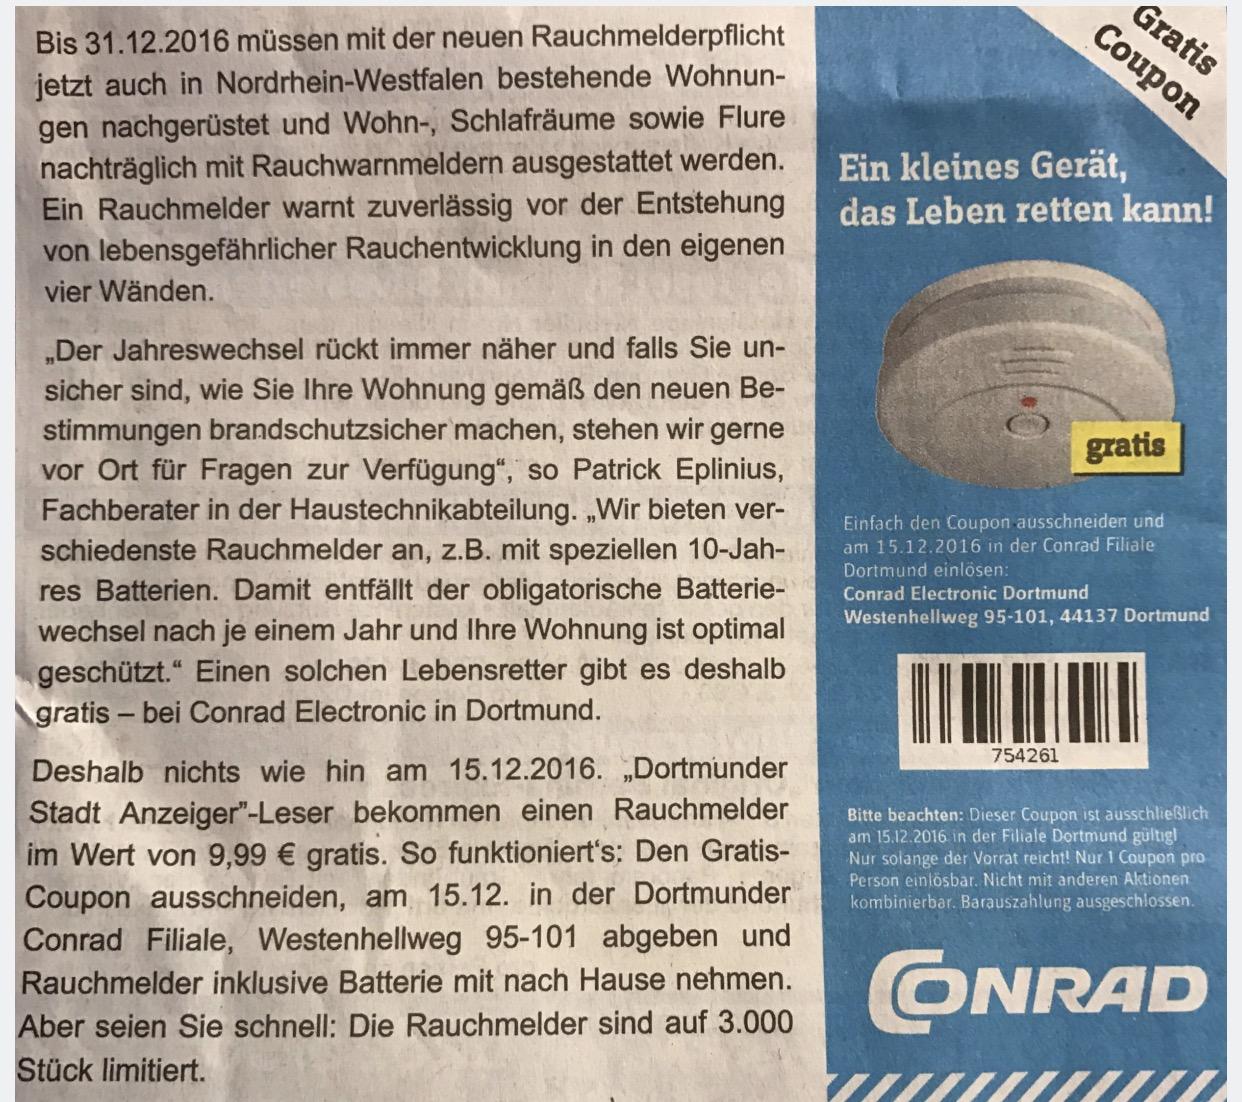 Lokal [Dortmund Conrad] Gratis Rauchmelder nur morgen gültig